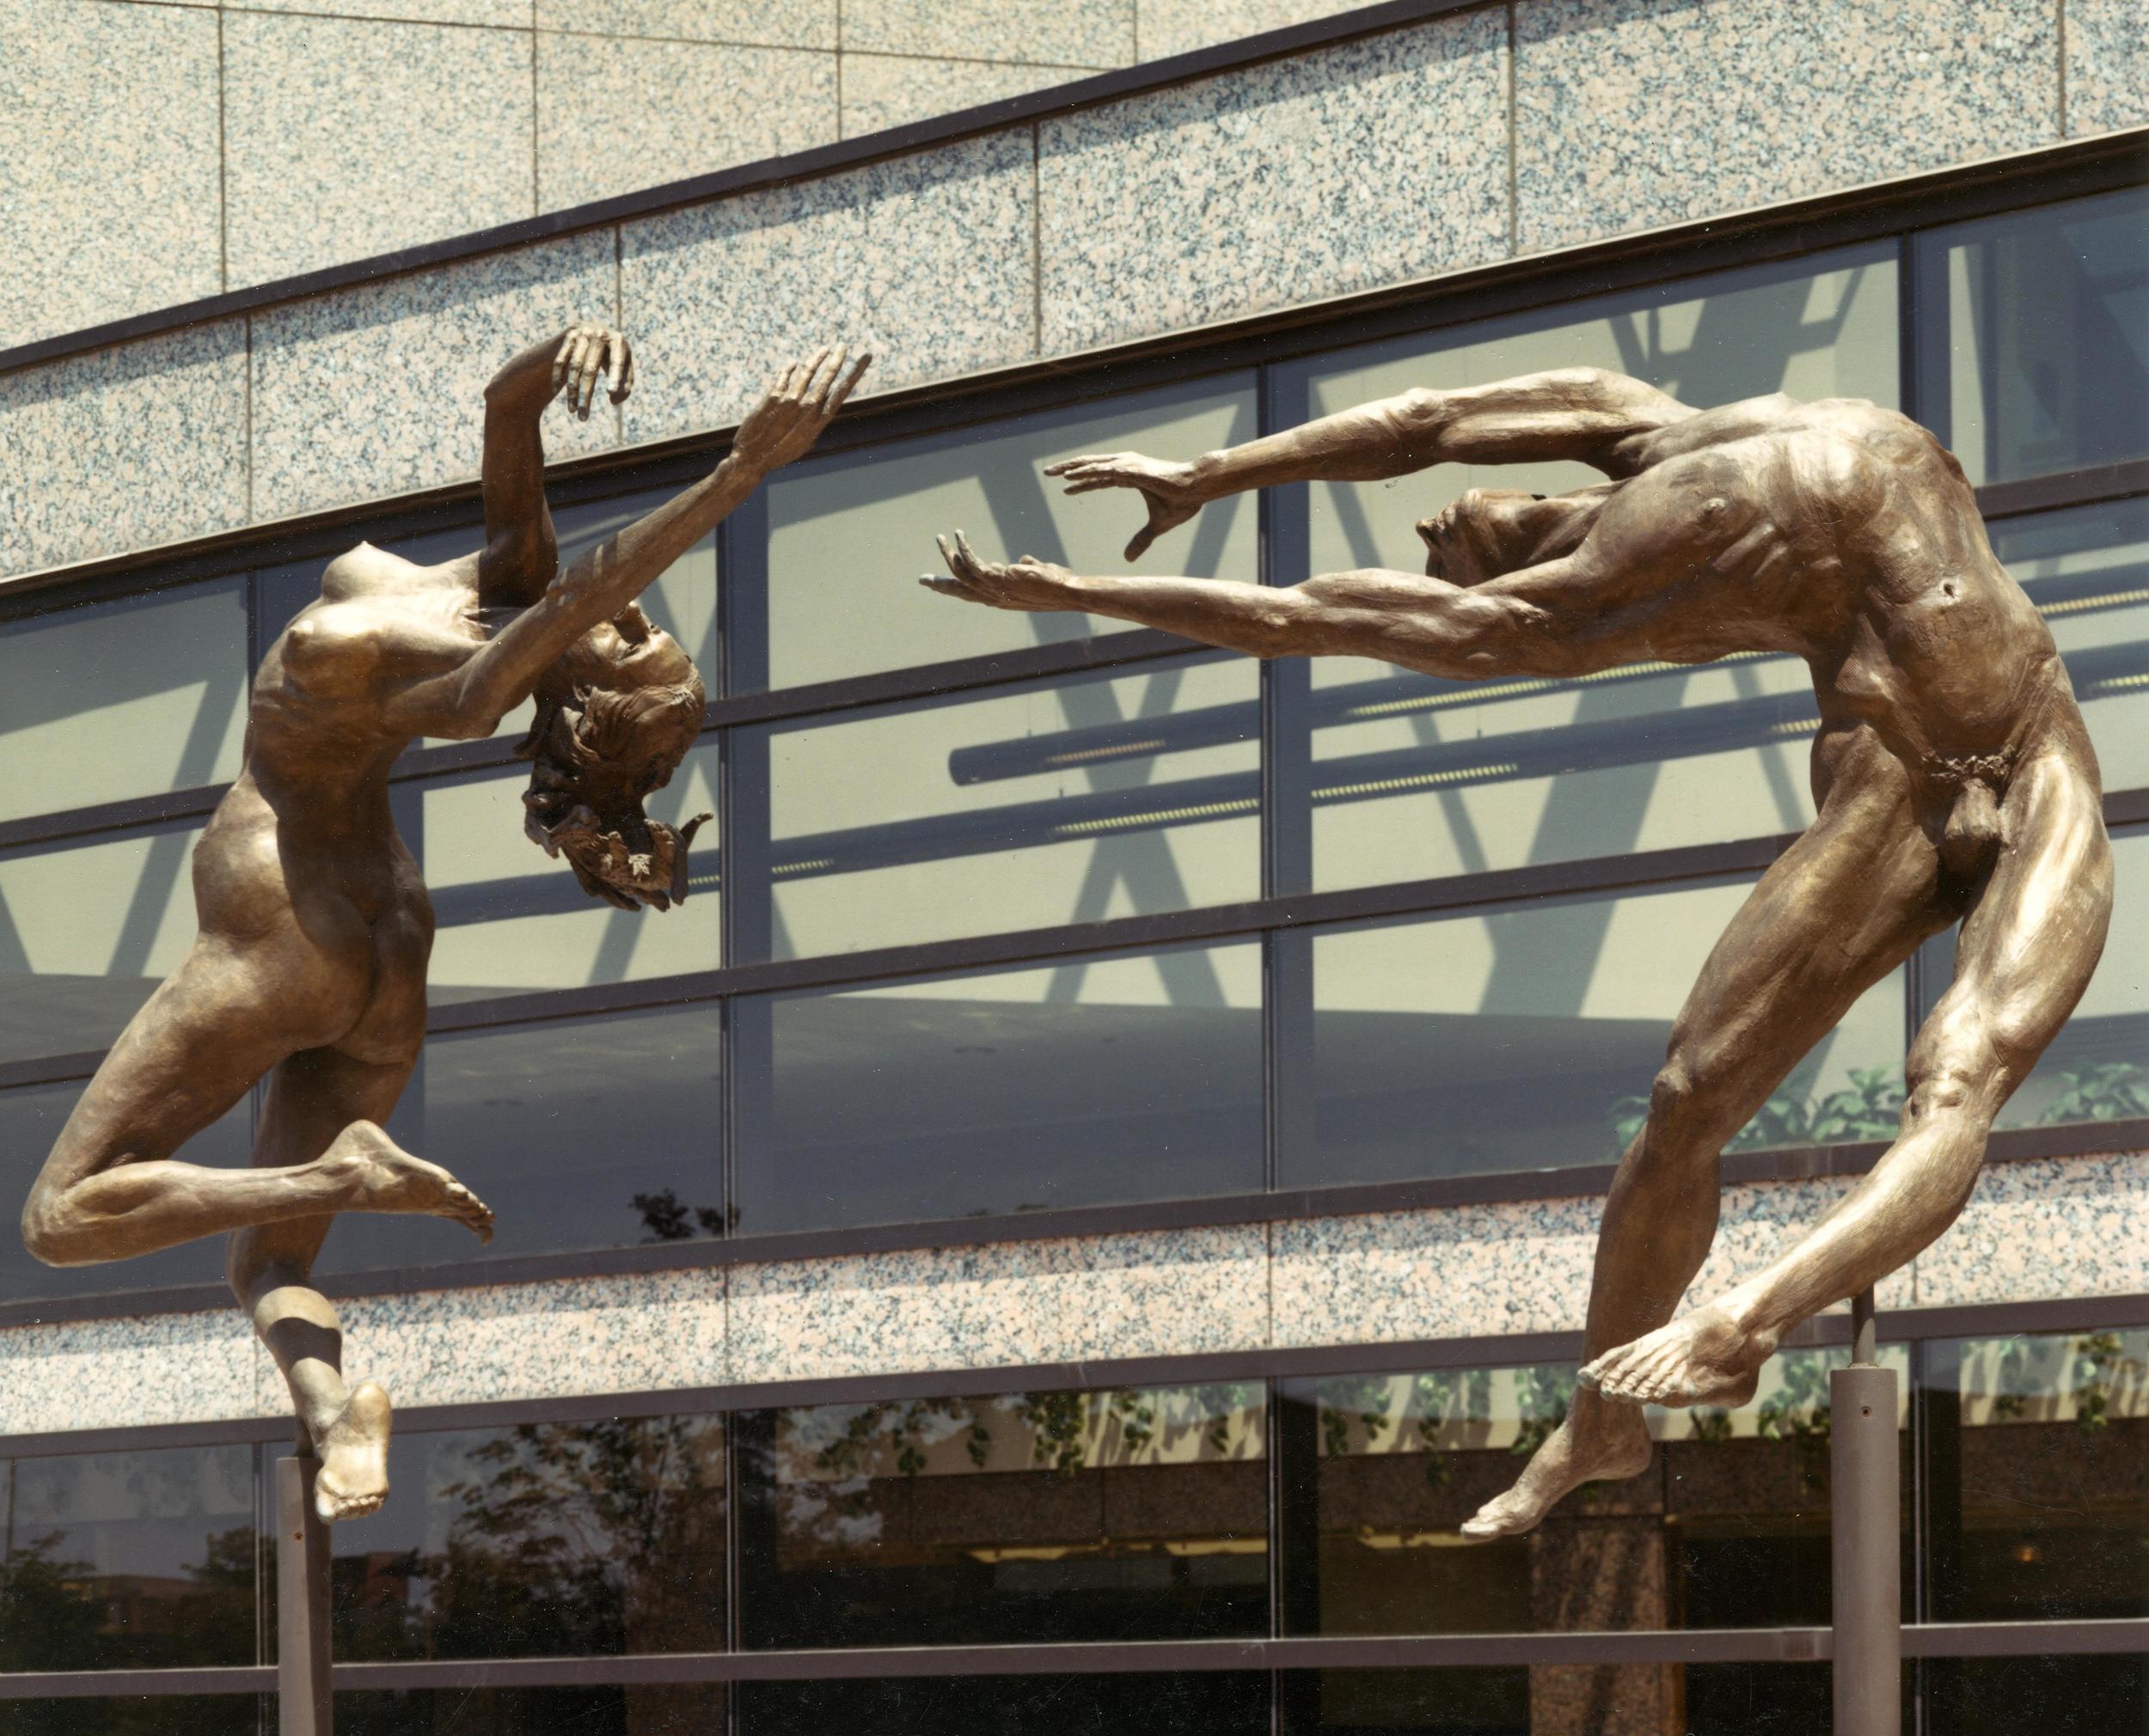 Reaching, public sculpture